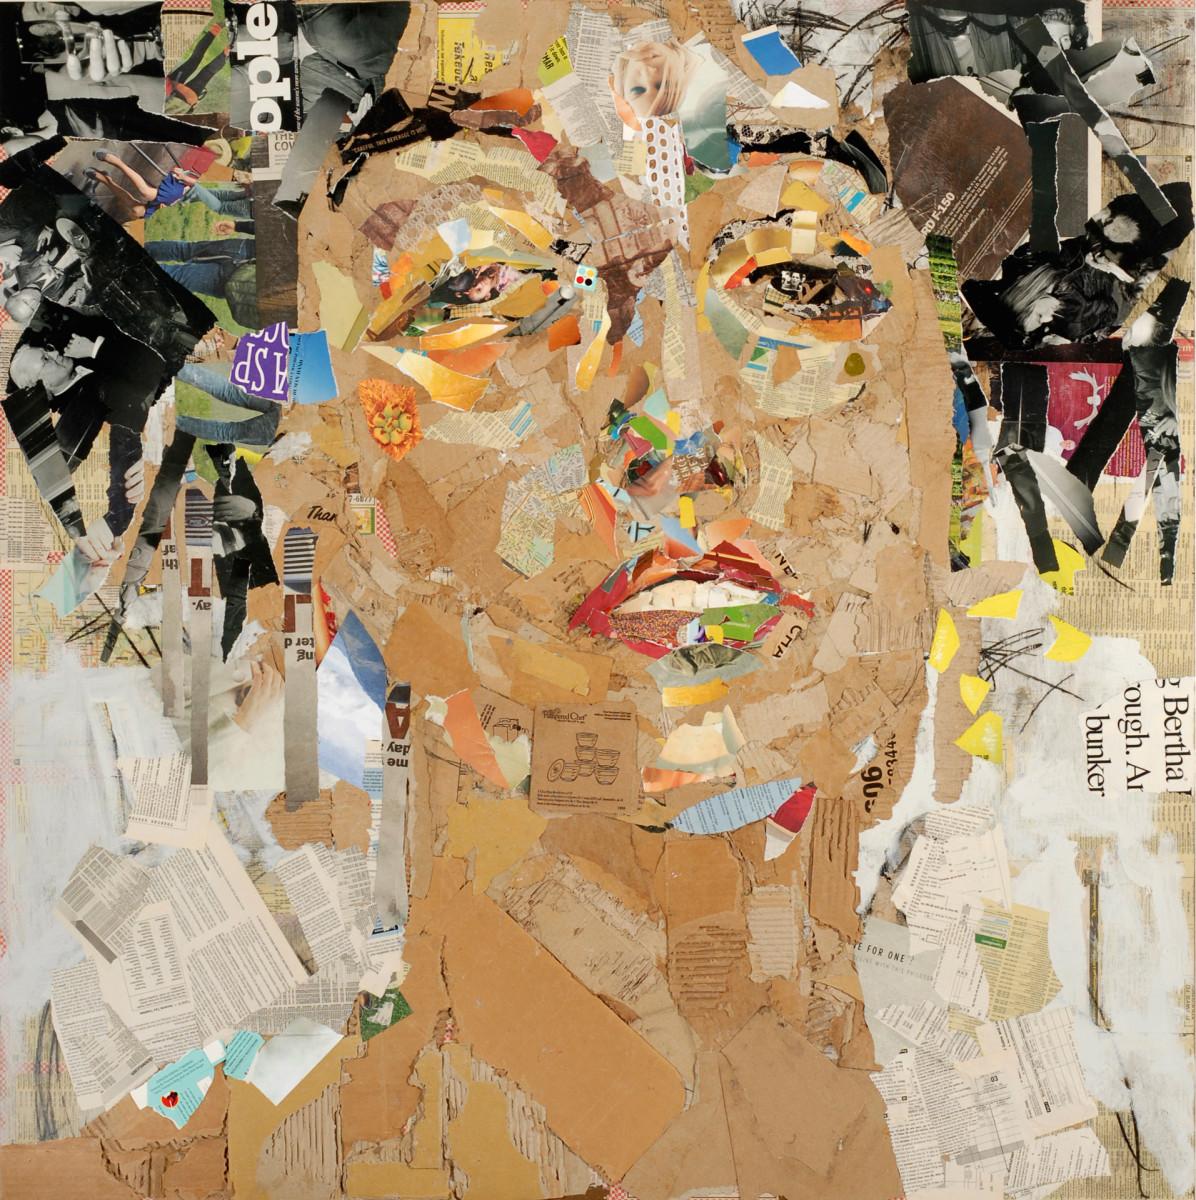 Visage (After Klimt's Muse) by Michael Gadlin